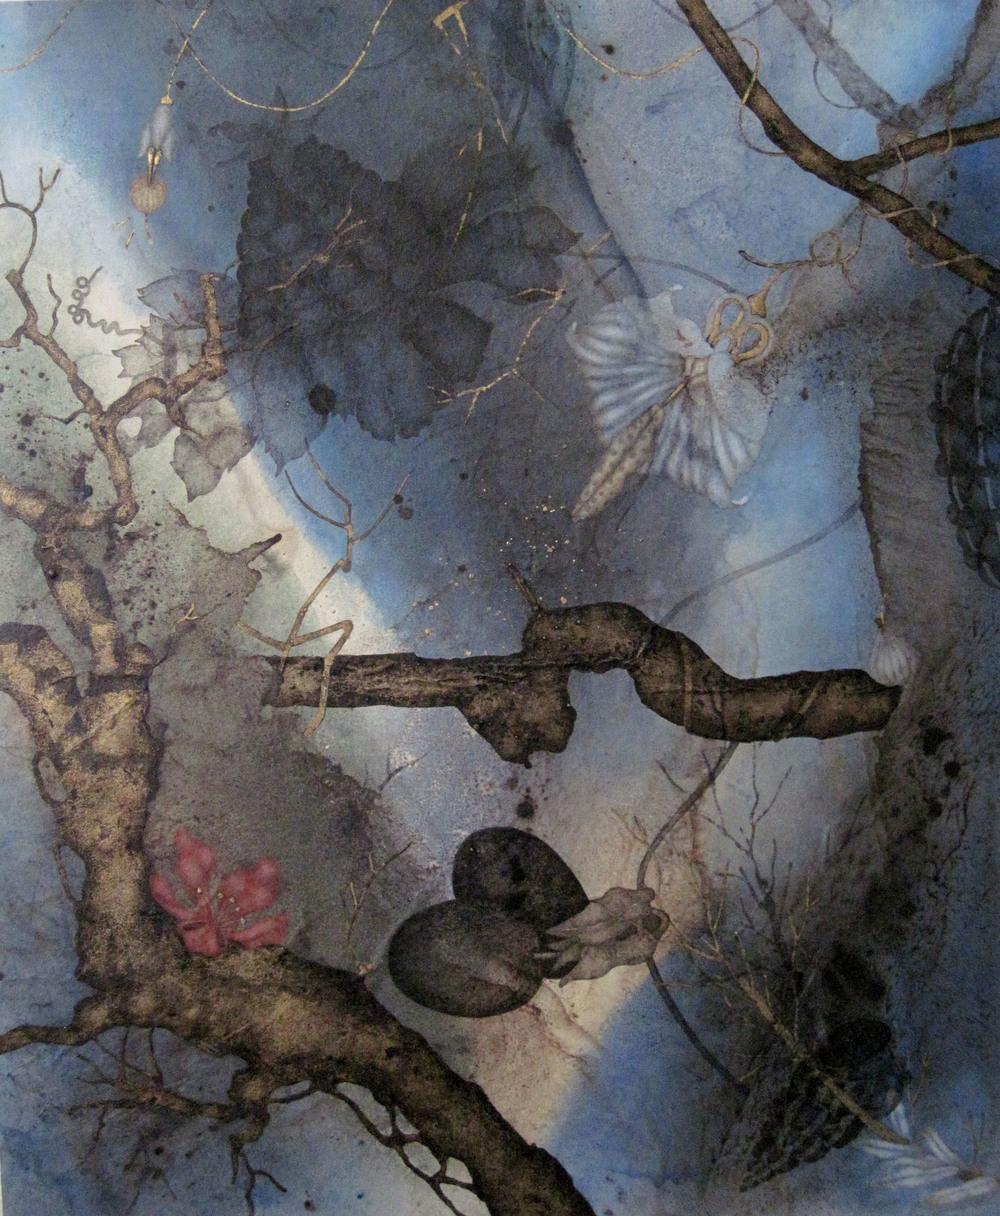 "Devil's Cut (2015), 24"" x 20"", Oil, asphaltum, gold leaf, and encaustic on Okawara paper, mounted on canvas"